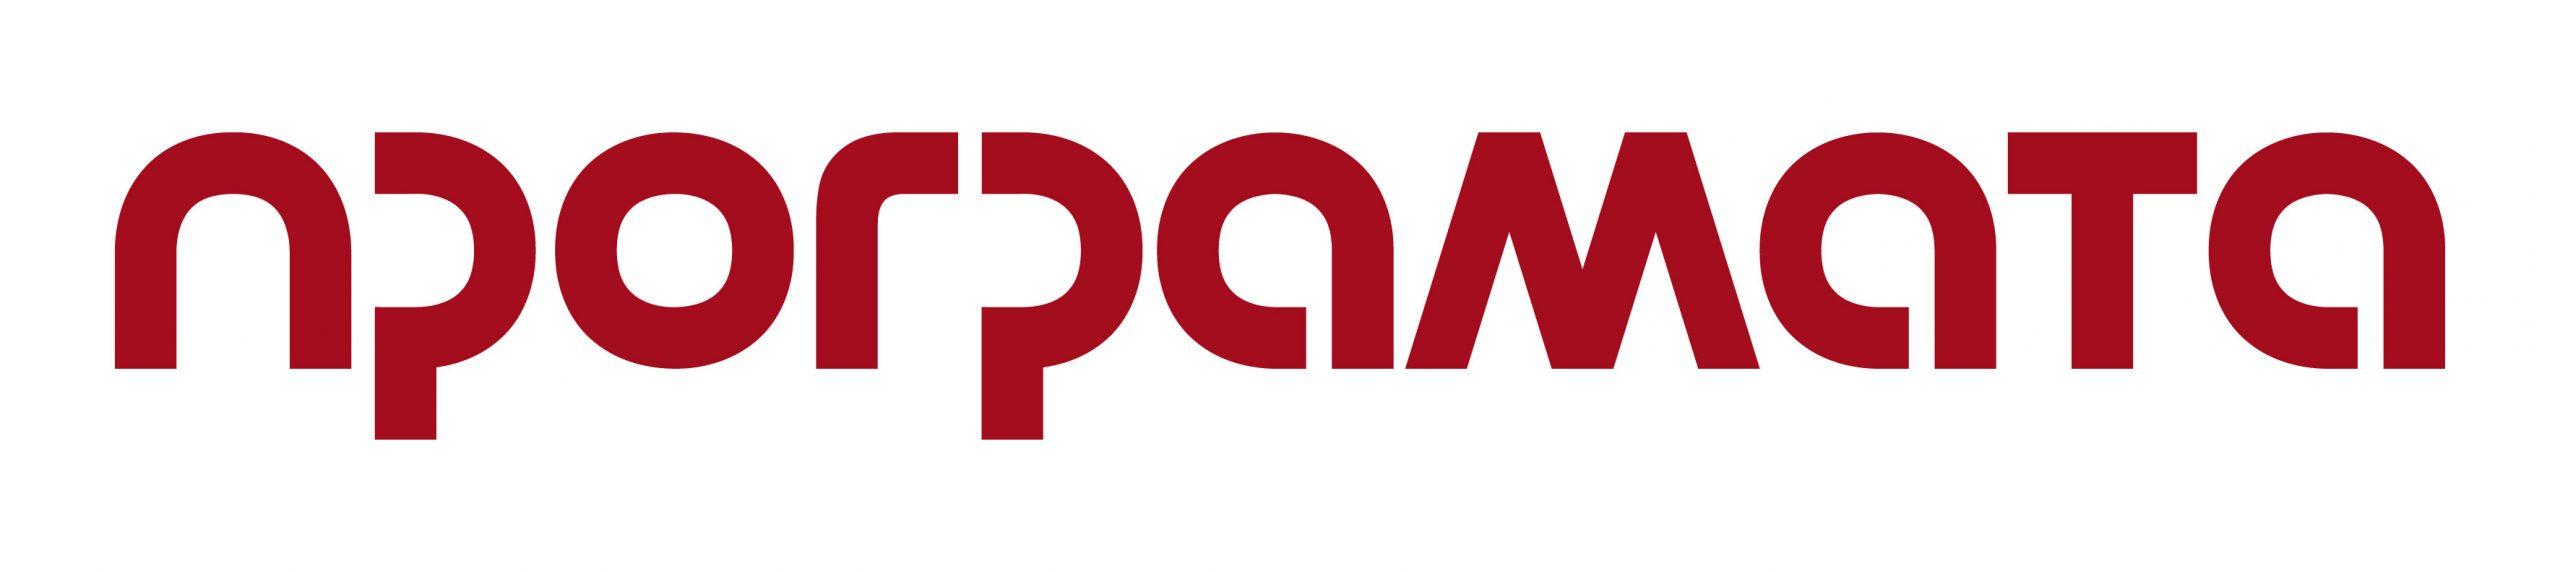 logo-programata-red-web